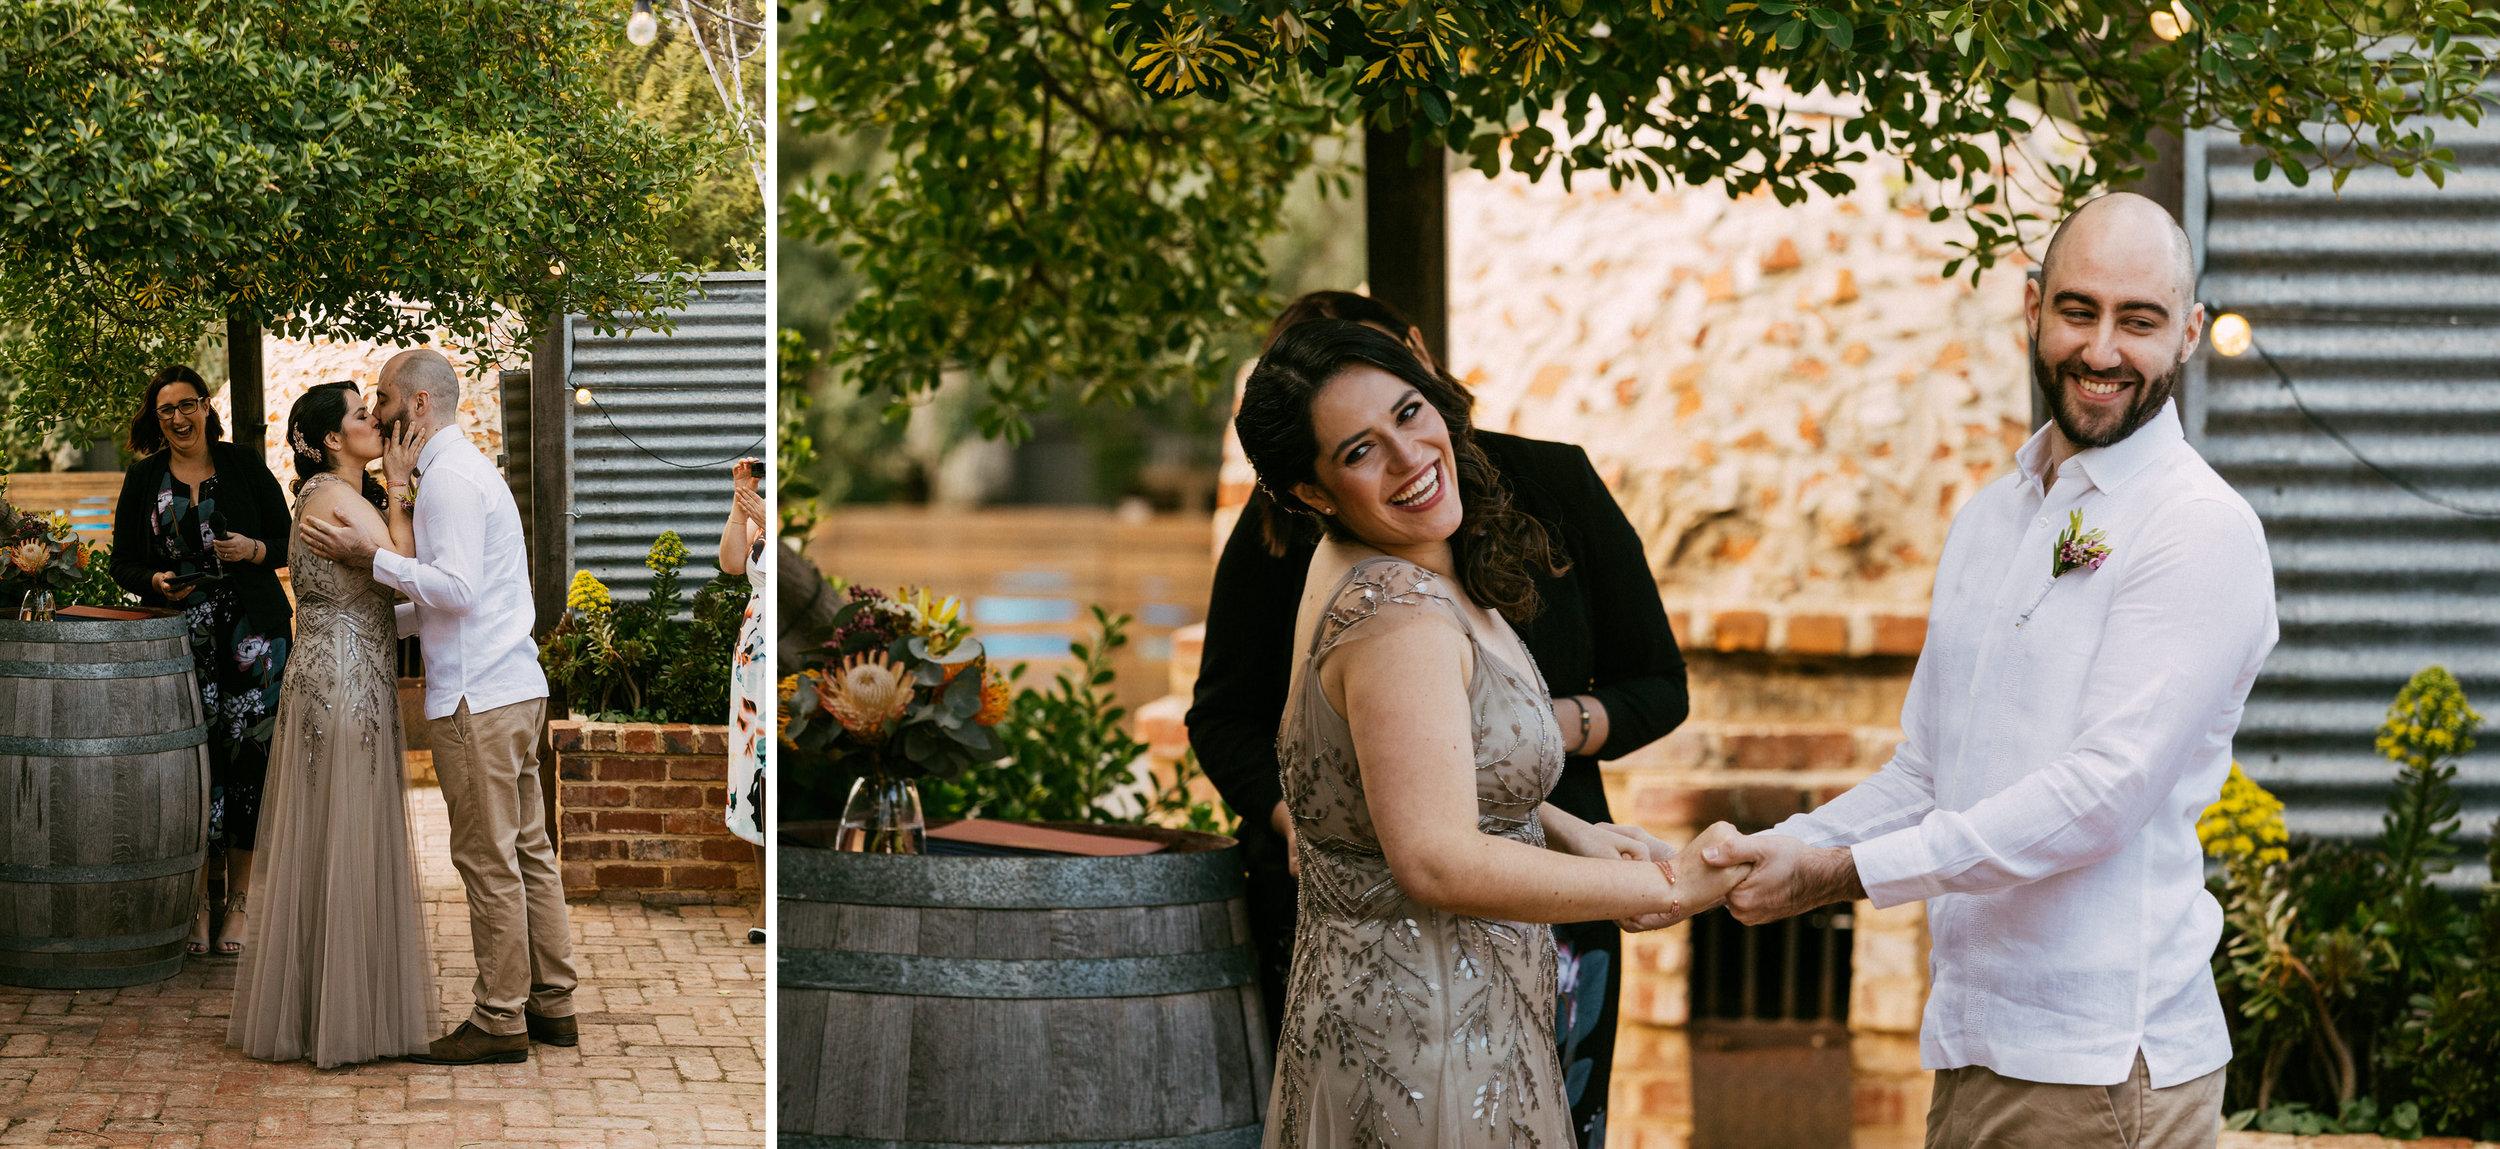 Barossa Valley Micro Wedding SA 015.JPG